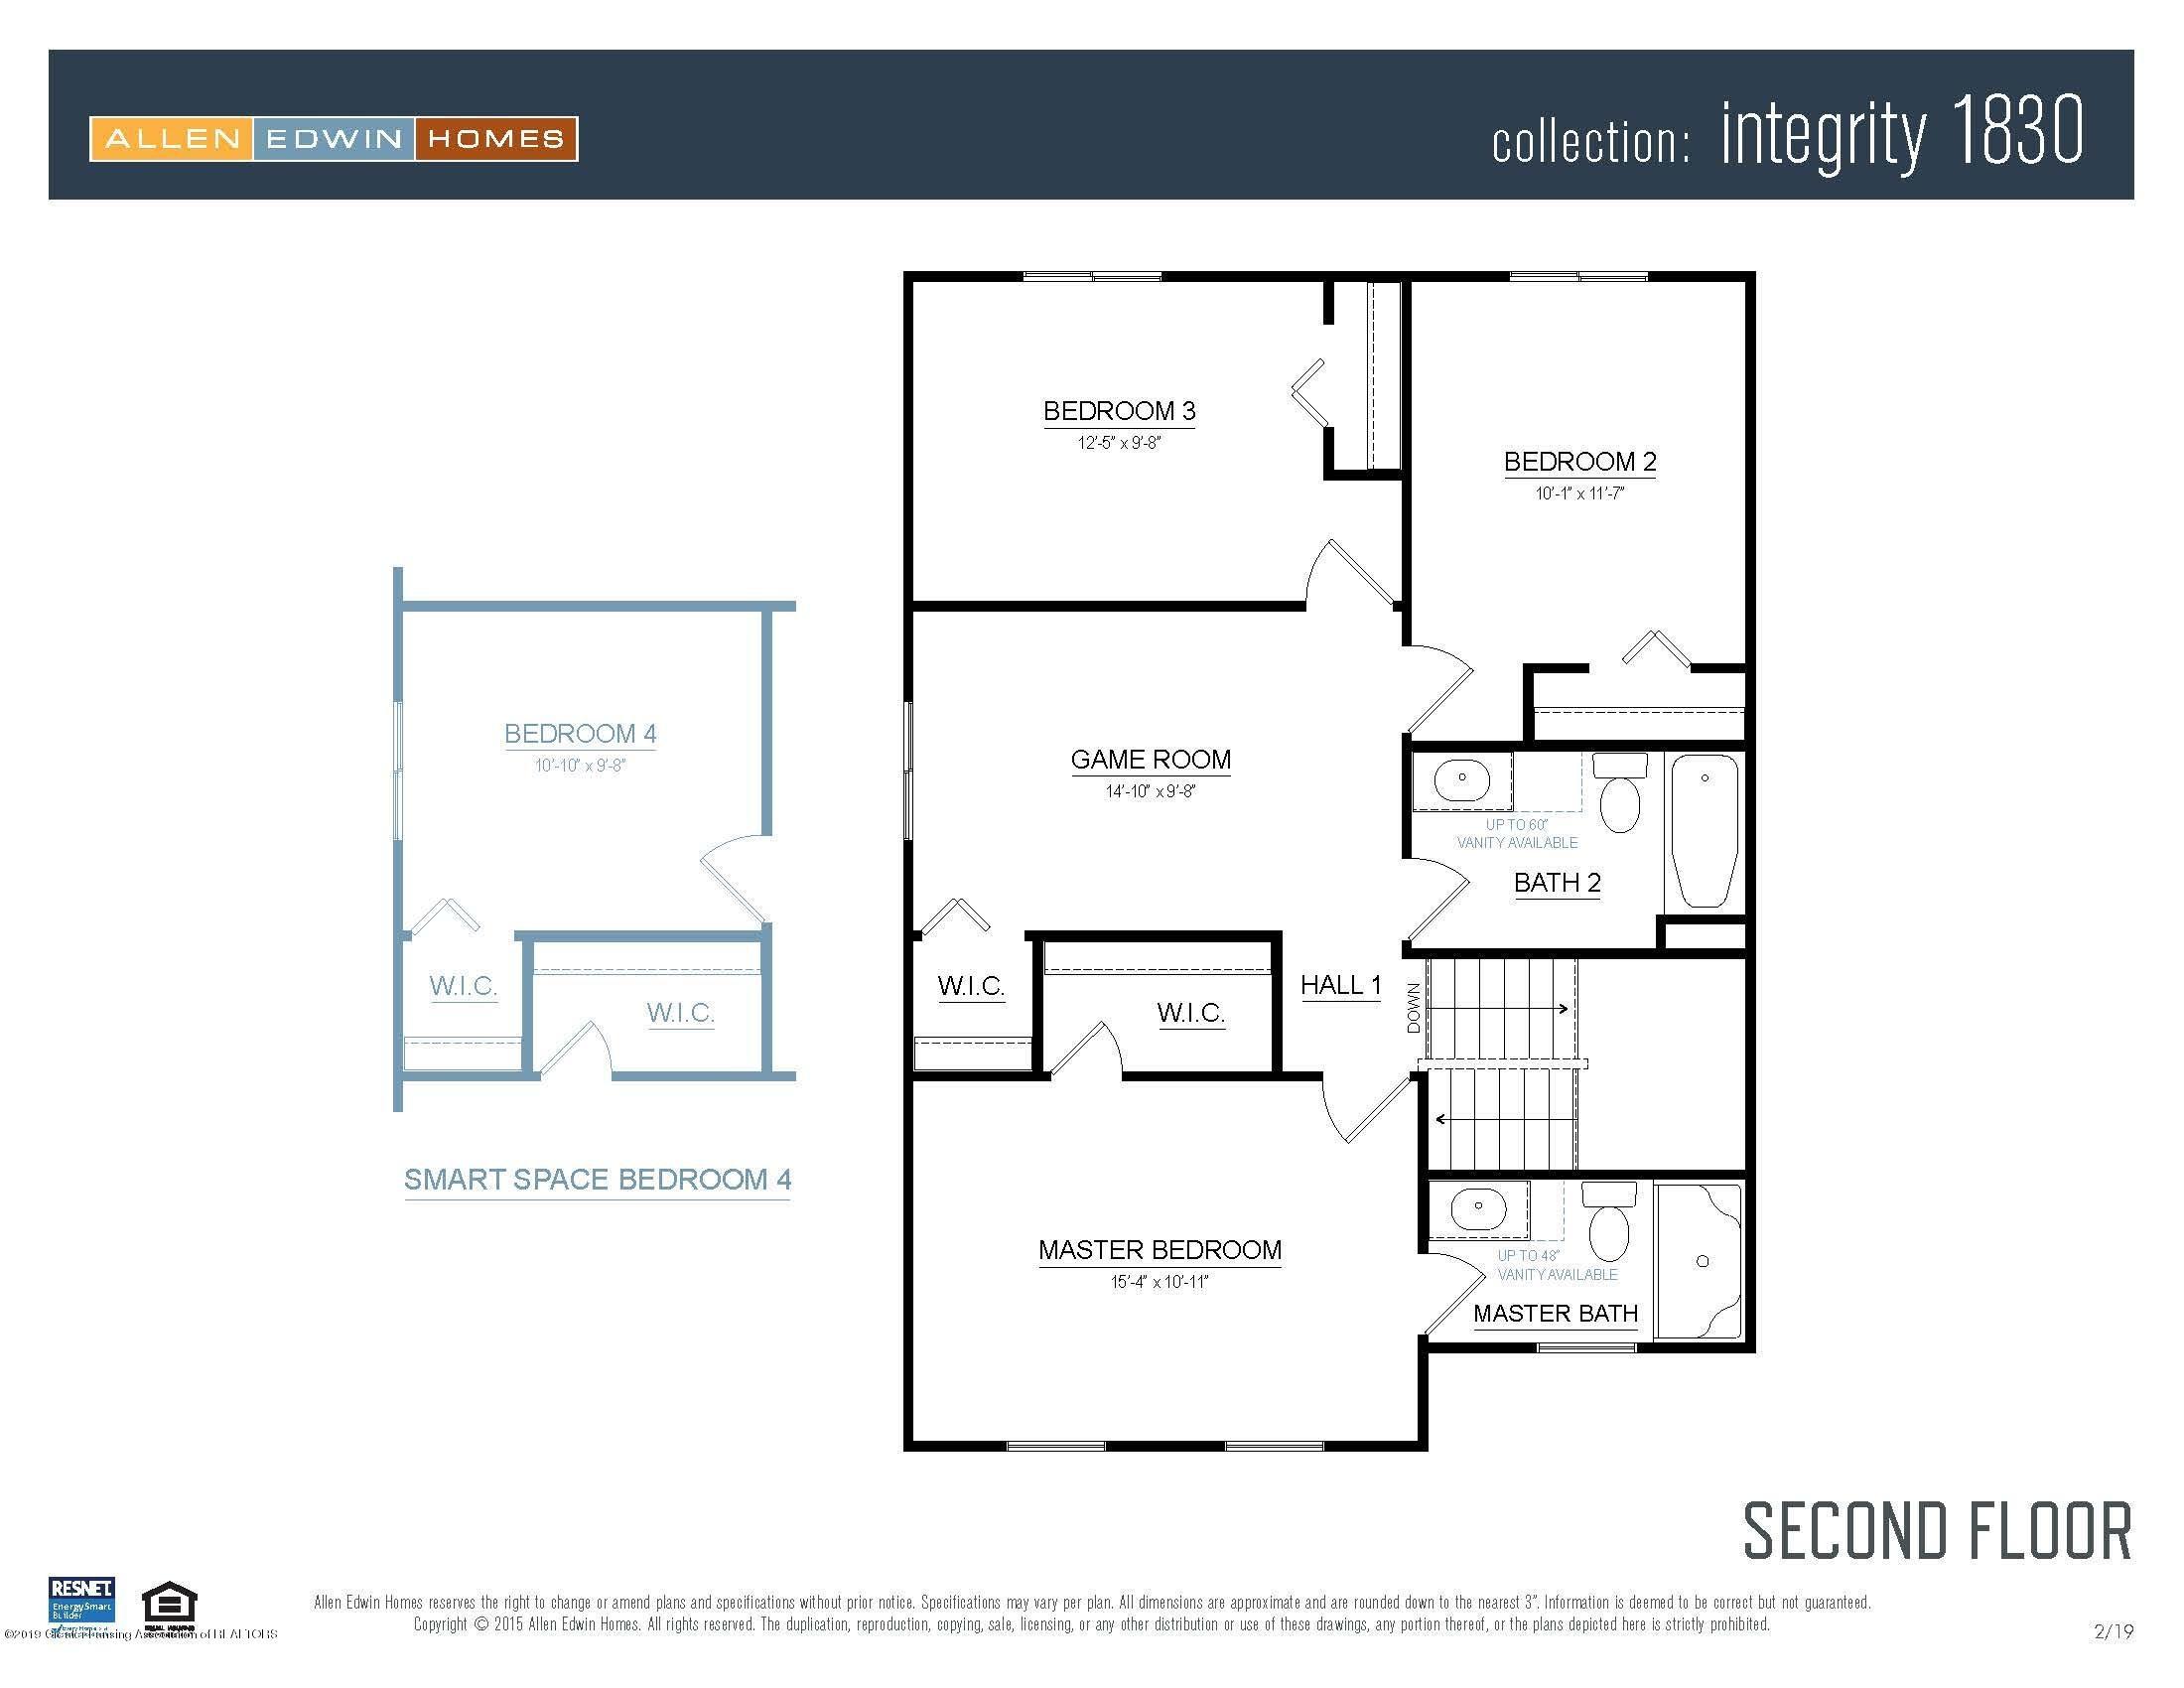 234 Noleigh - Integrity 1830 V8.1a Second Floor - 5